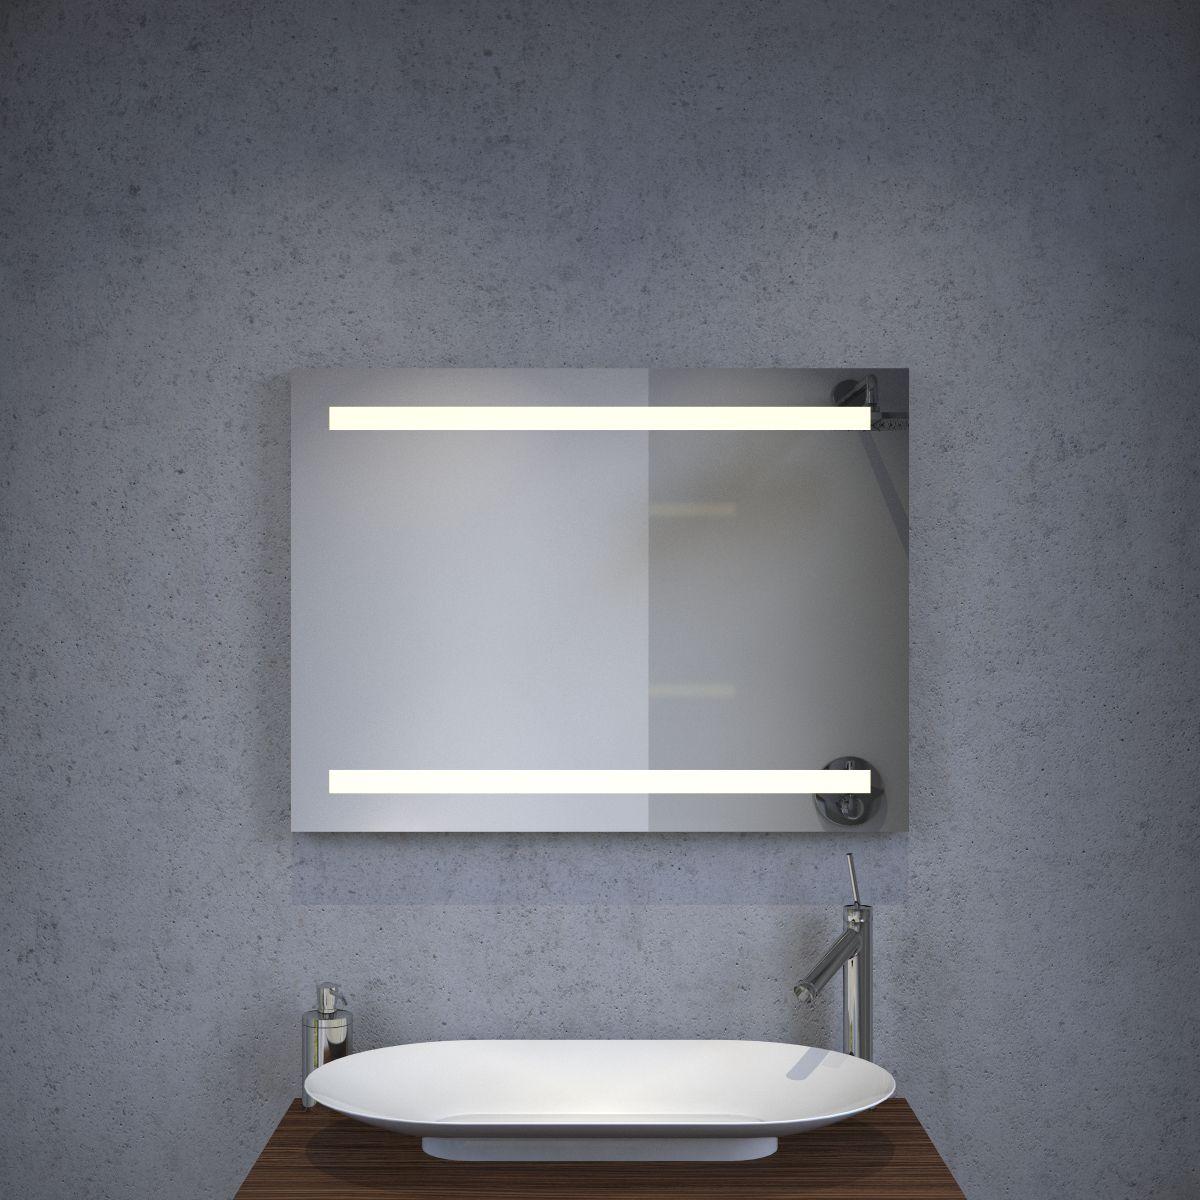 Verwarmde badkamer LED spiegel met sensor 80x60 cm - Designspiegels